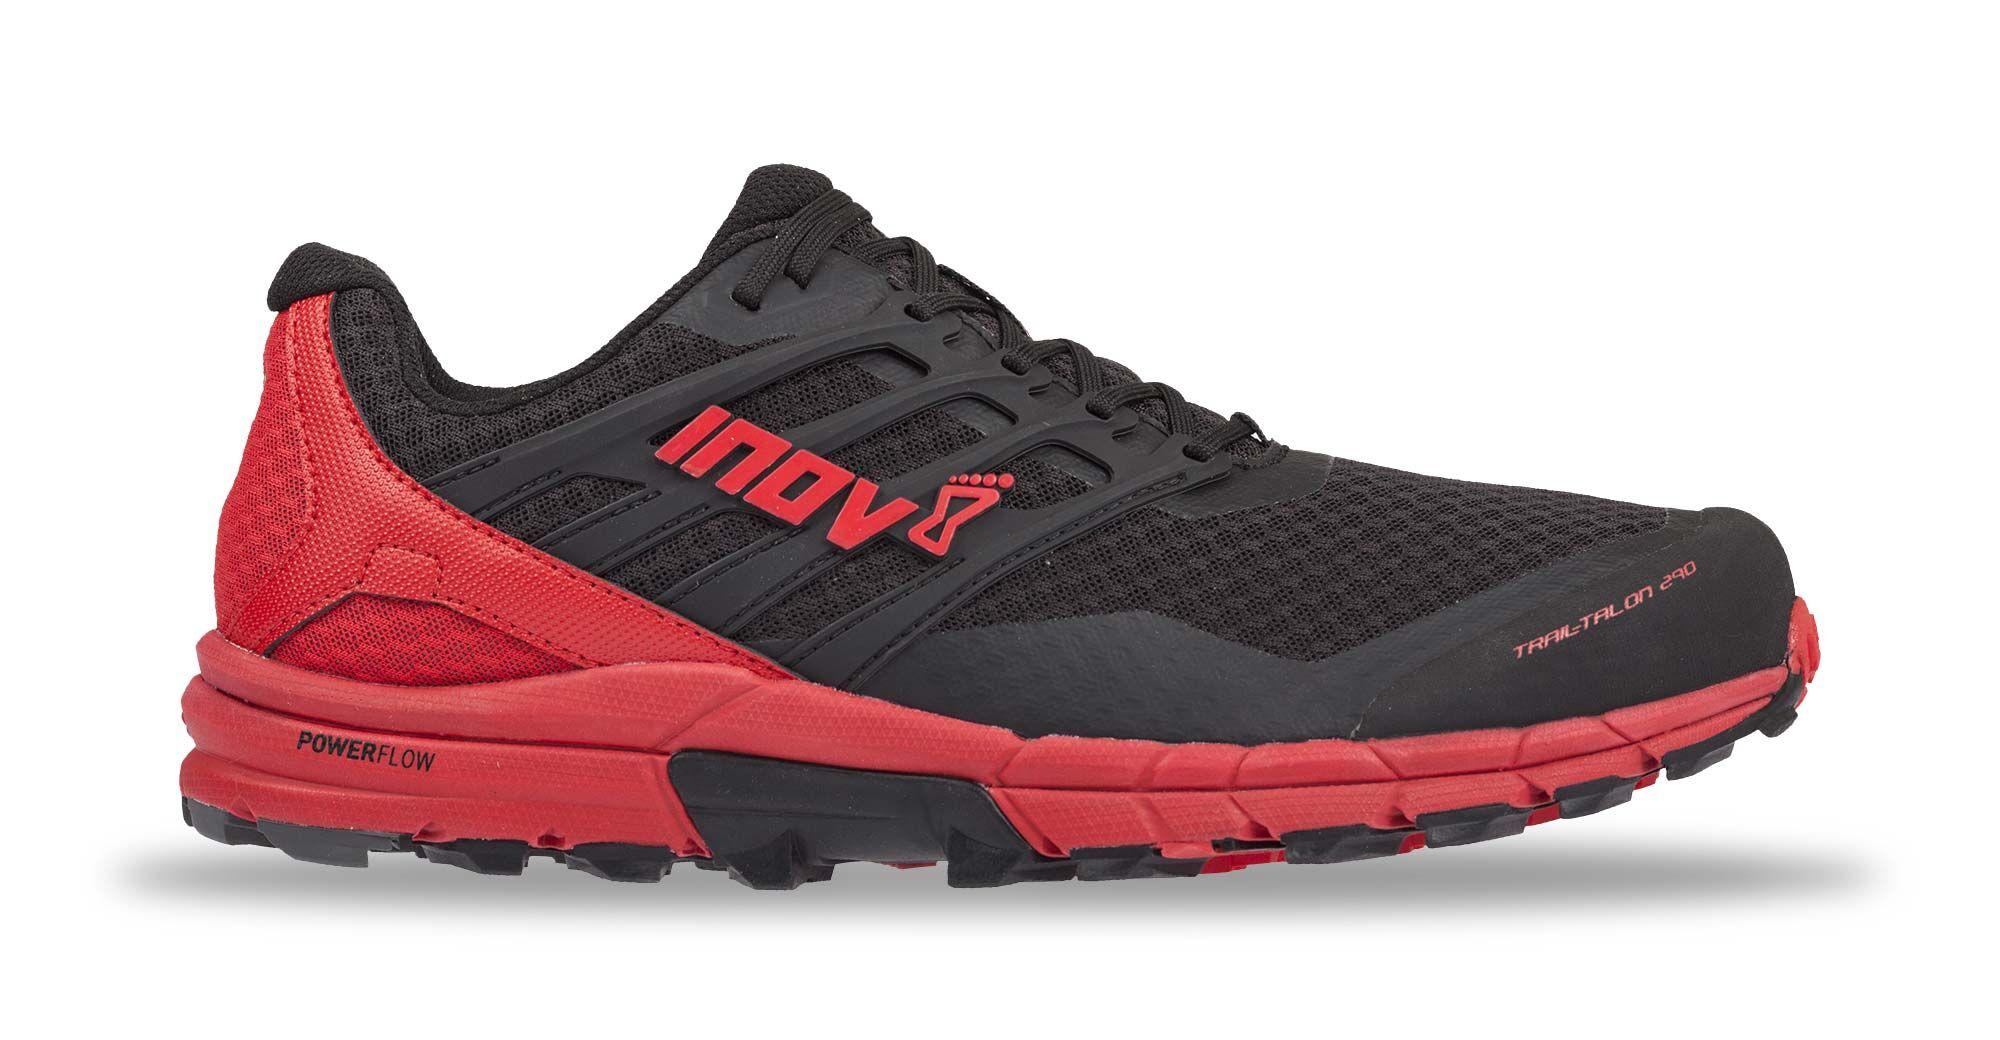 Trailtalon 290 Men's Running Shoe | inov-8